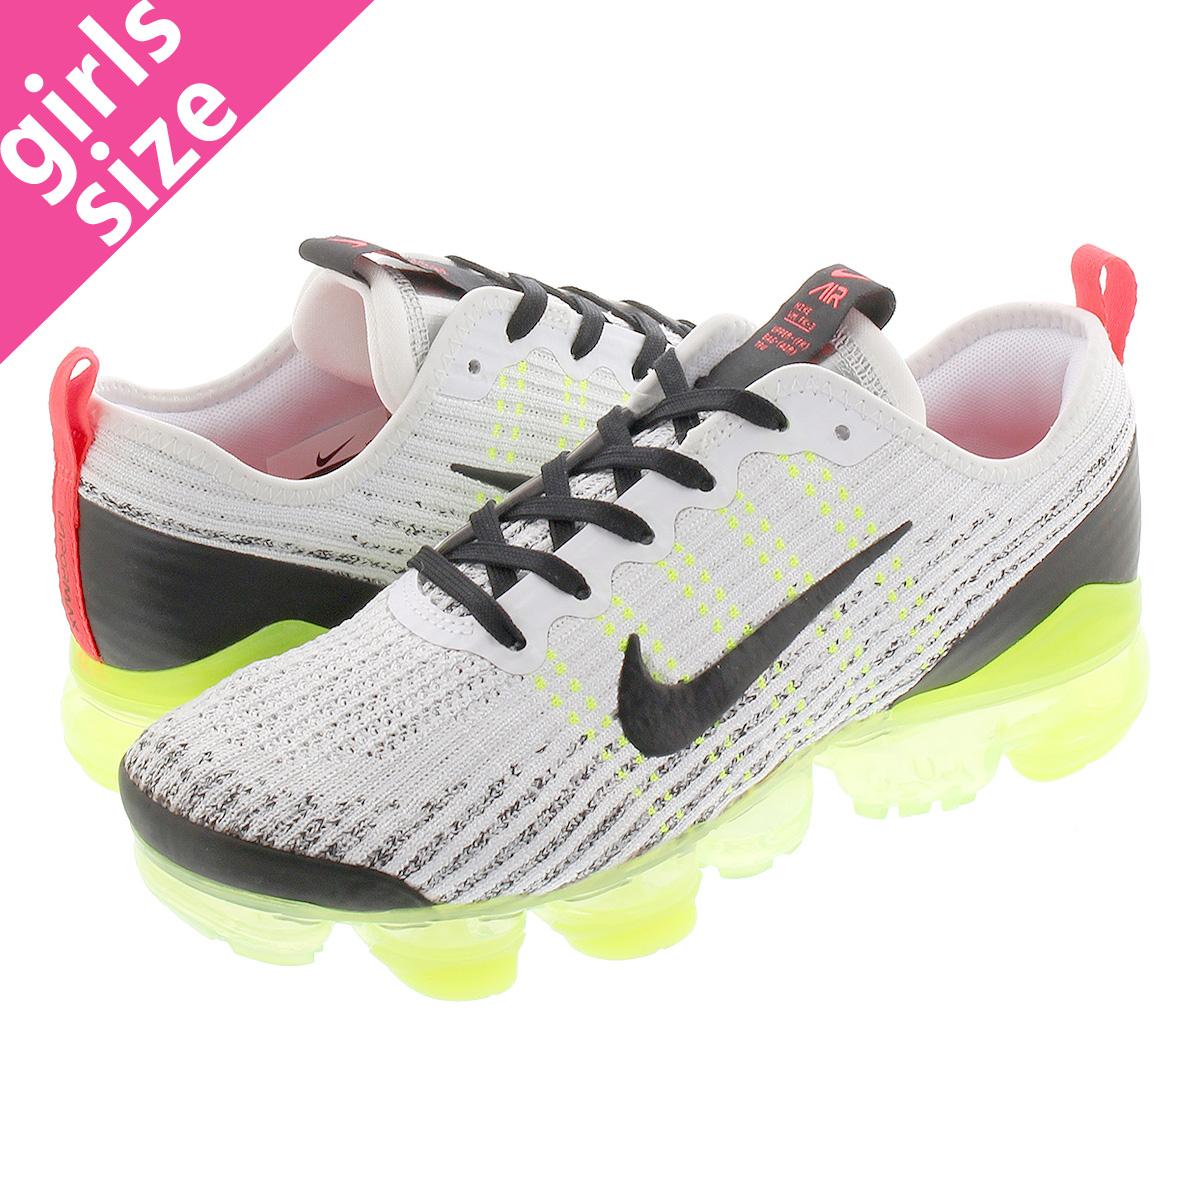 Nike Air Vapormax Flyknit 3 GS Running Trainers BQ5238